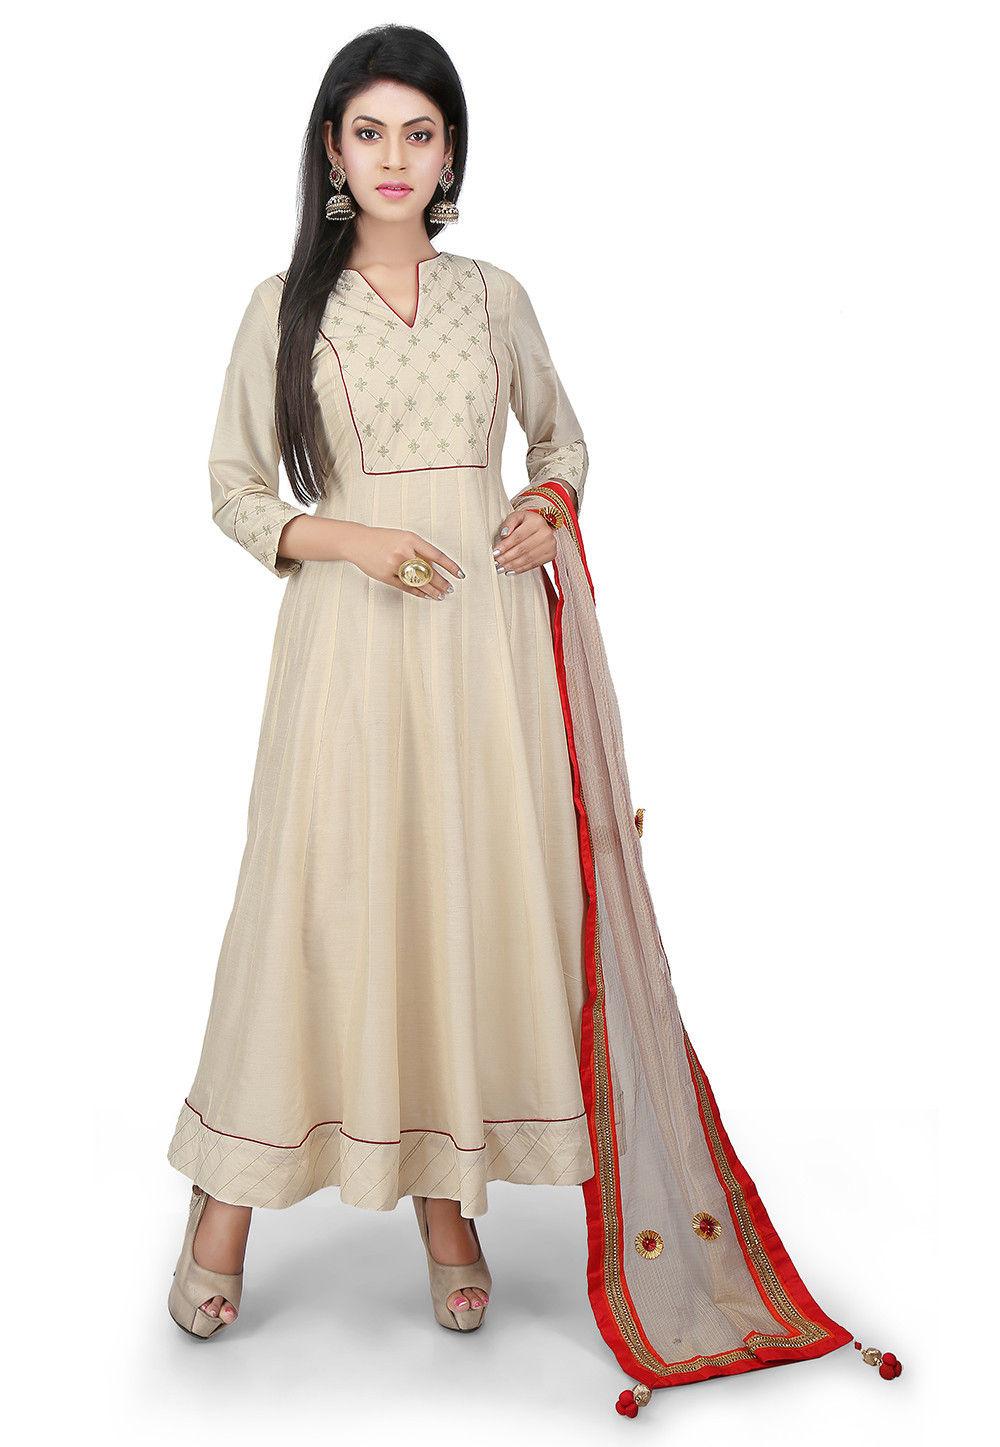 ba5c93d7f7 ... Salwar Kameez; Embroidered Cotton Silk Anarkali Suit in Off White. Zoom